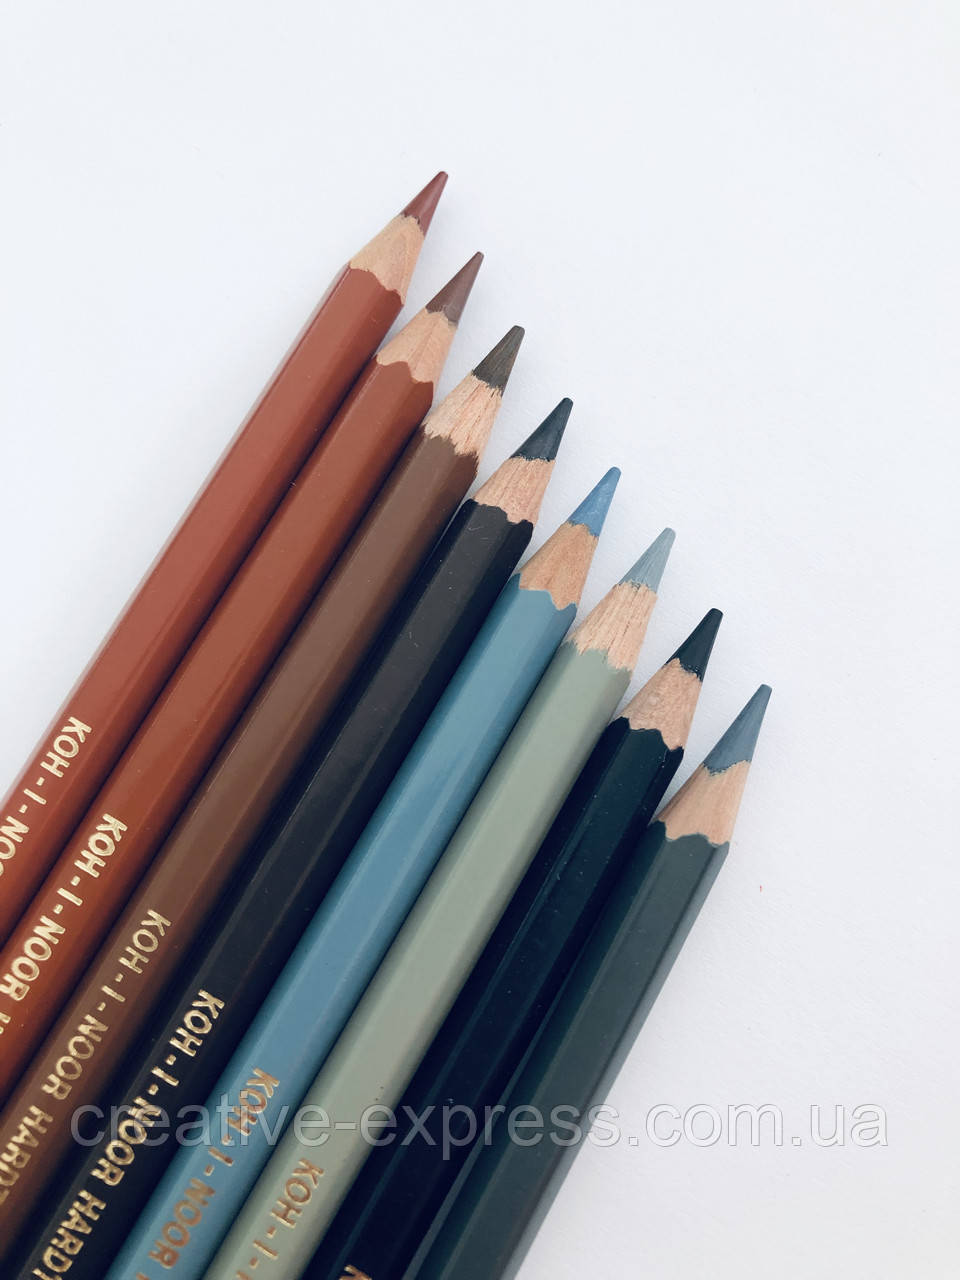 Олівці кол. аквар. MONDELUZ reddish brown